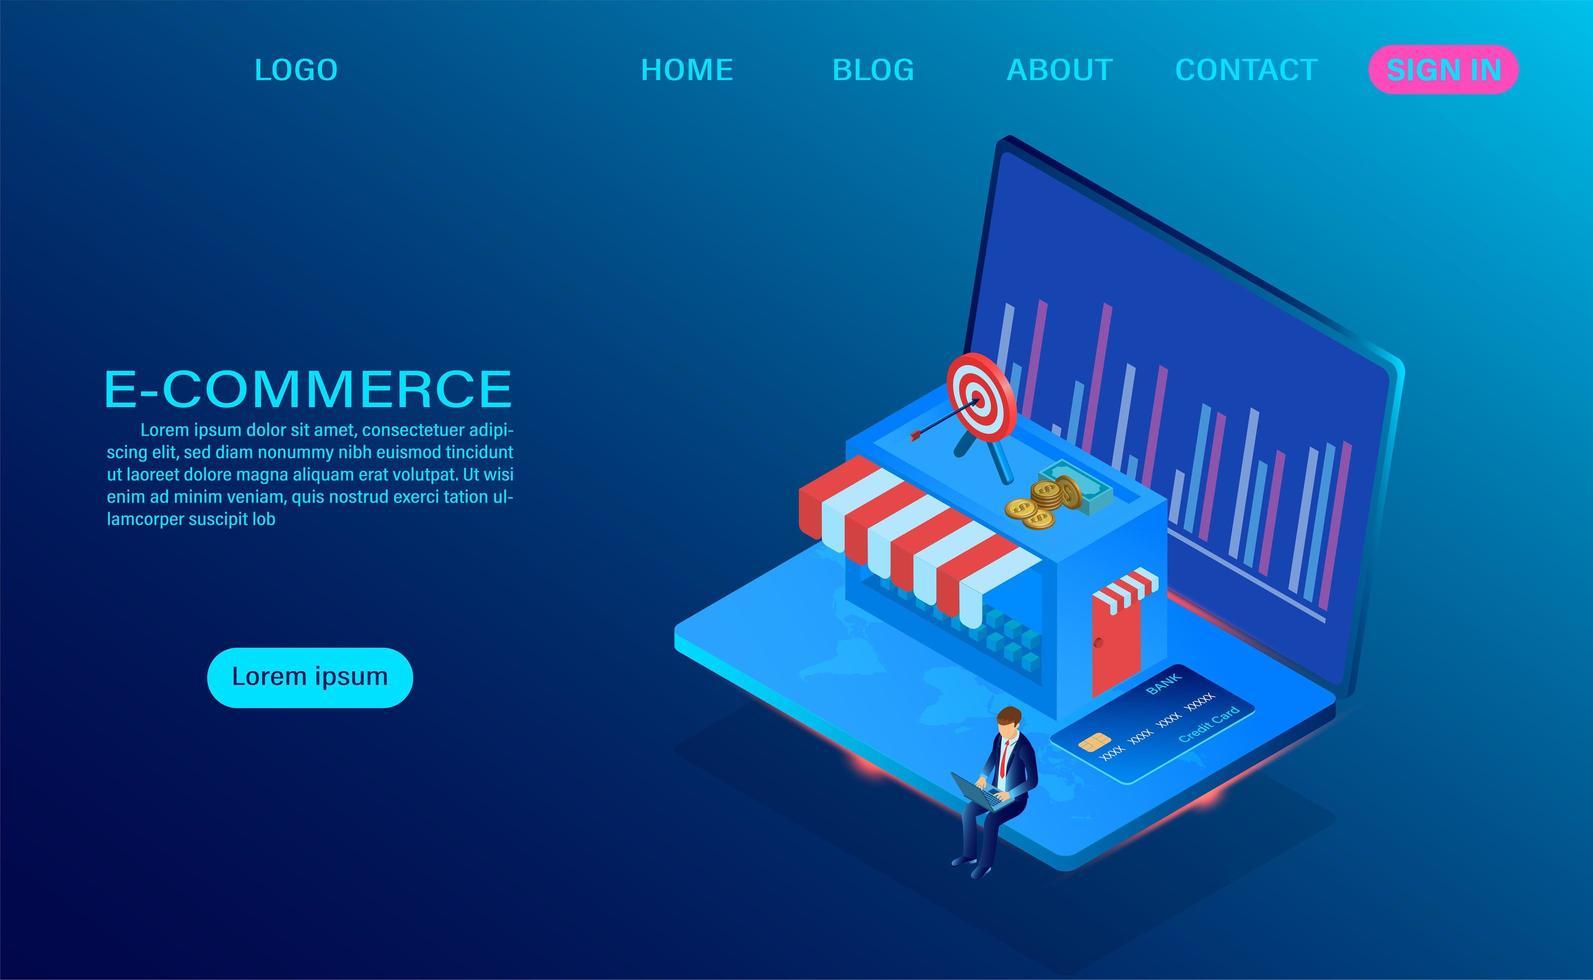 comercio electrónico de compras en línea con concepto de computadora portátil vector